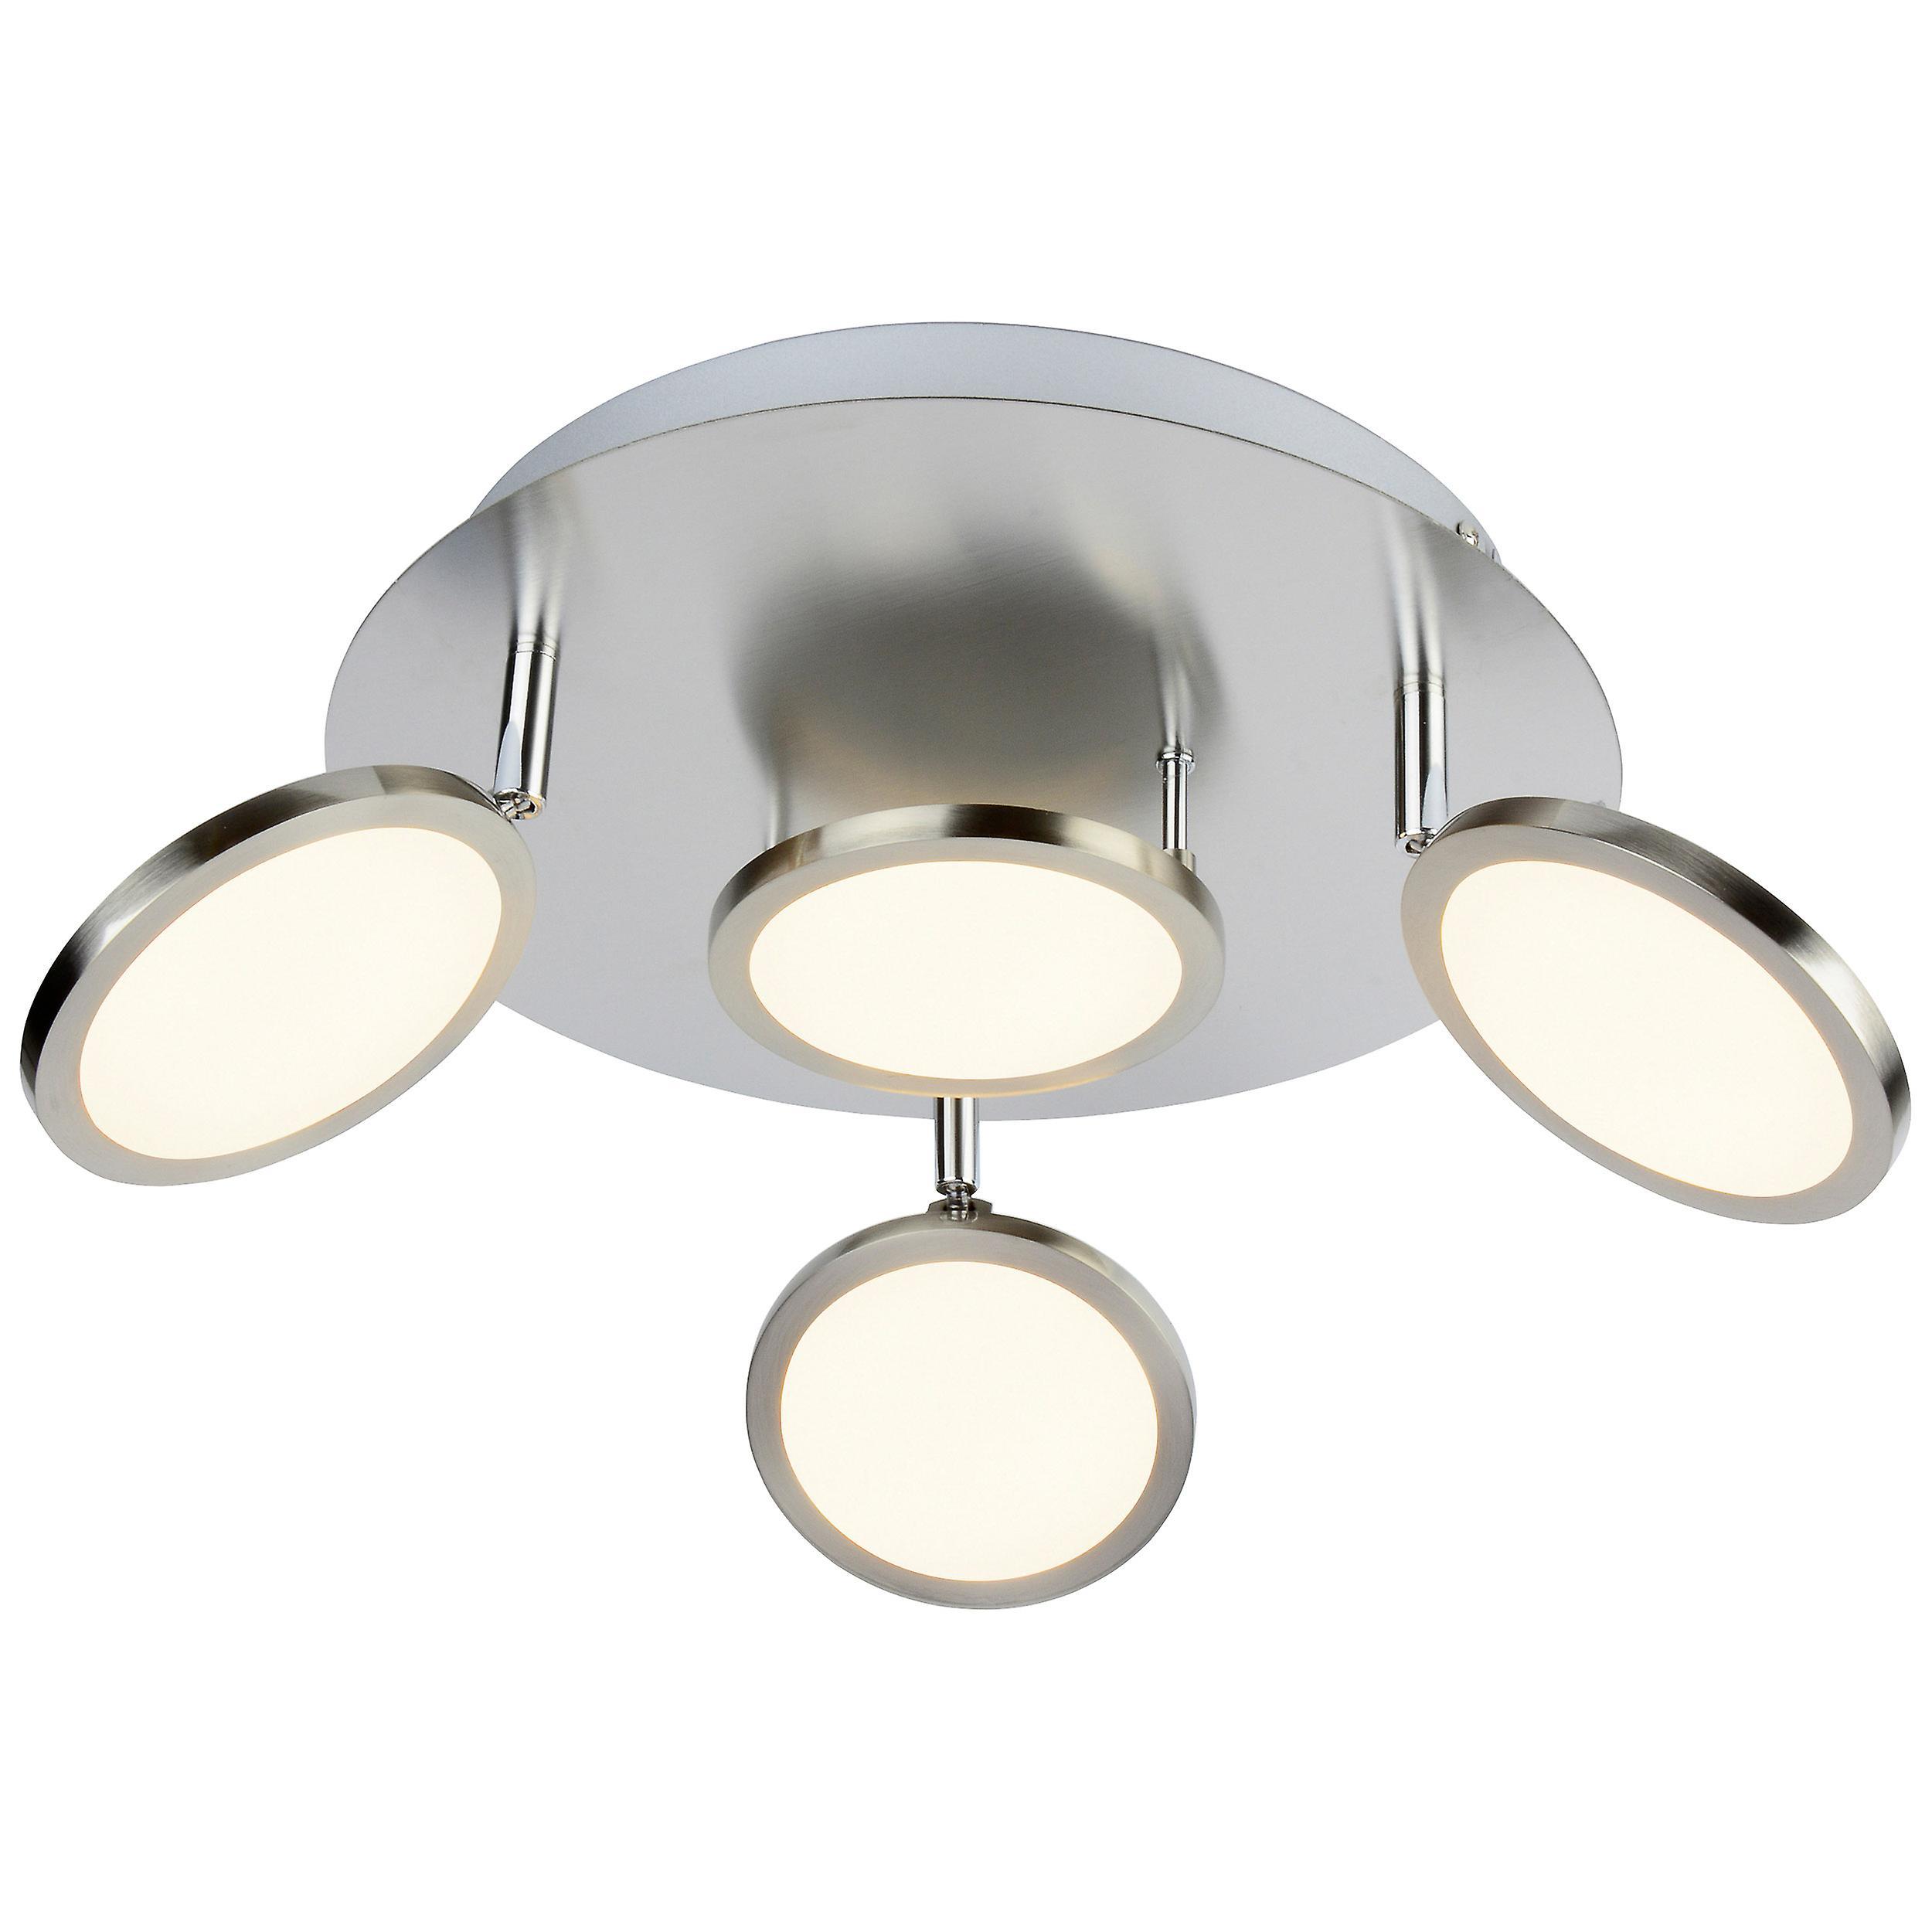 BRILLIANT Lampe HARLIE LED Spotrondell 4flg nickel matt I Köpfe schwenkbar I Energiesparend und langlebig durch LED-Einsatz